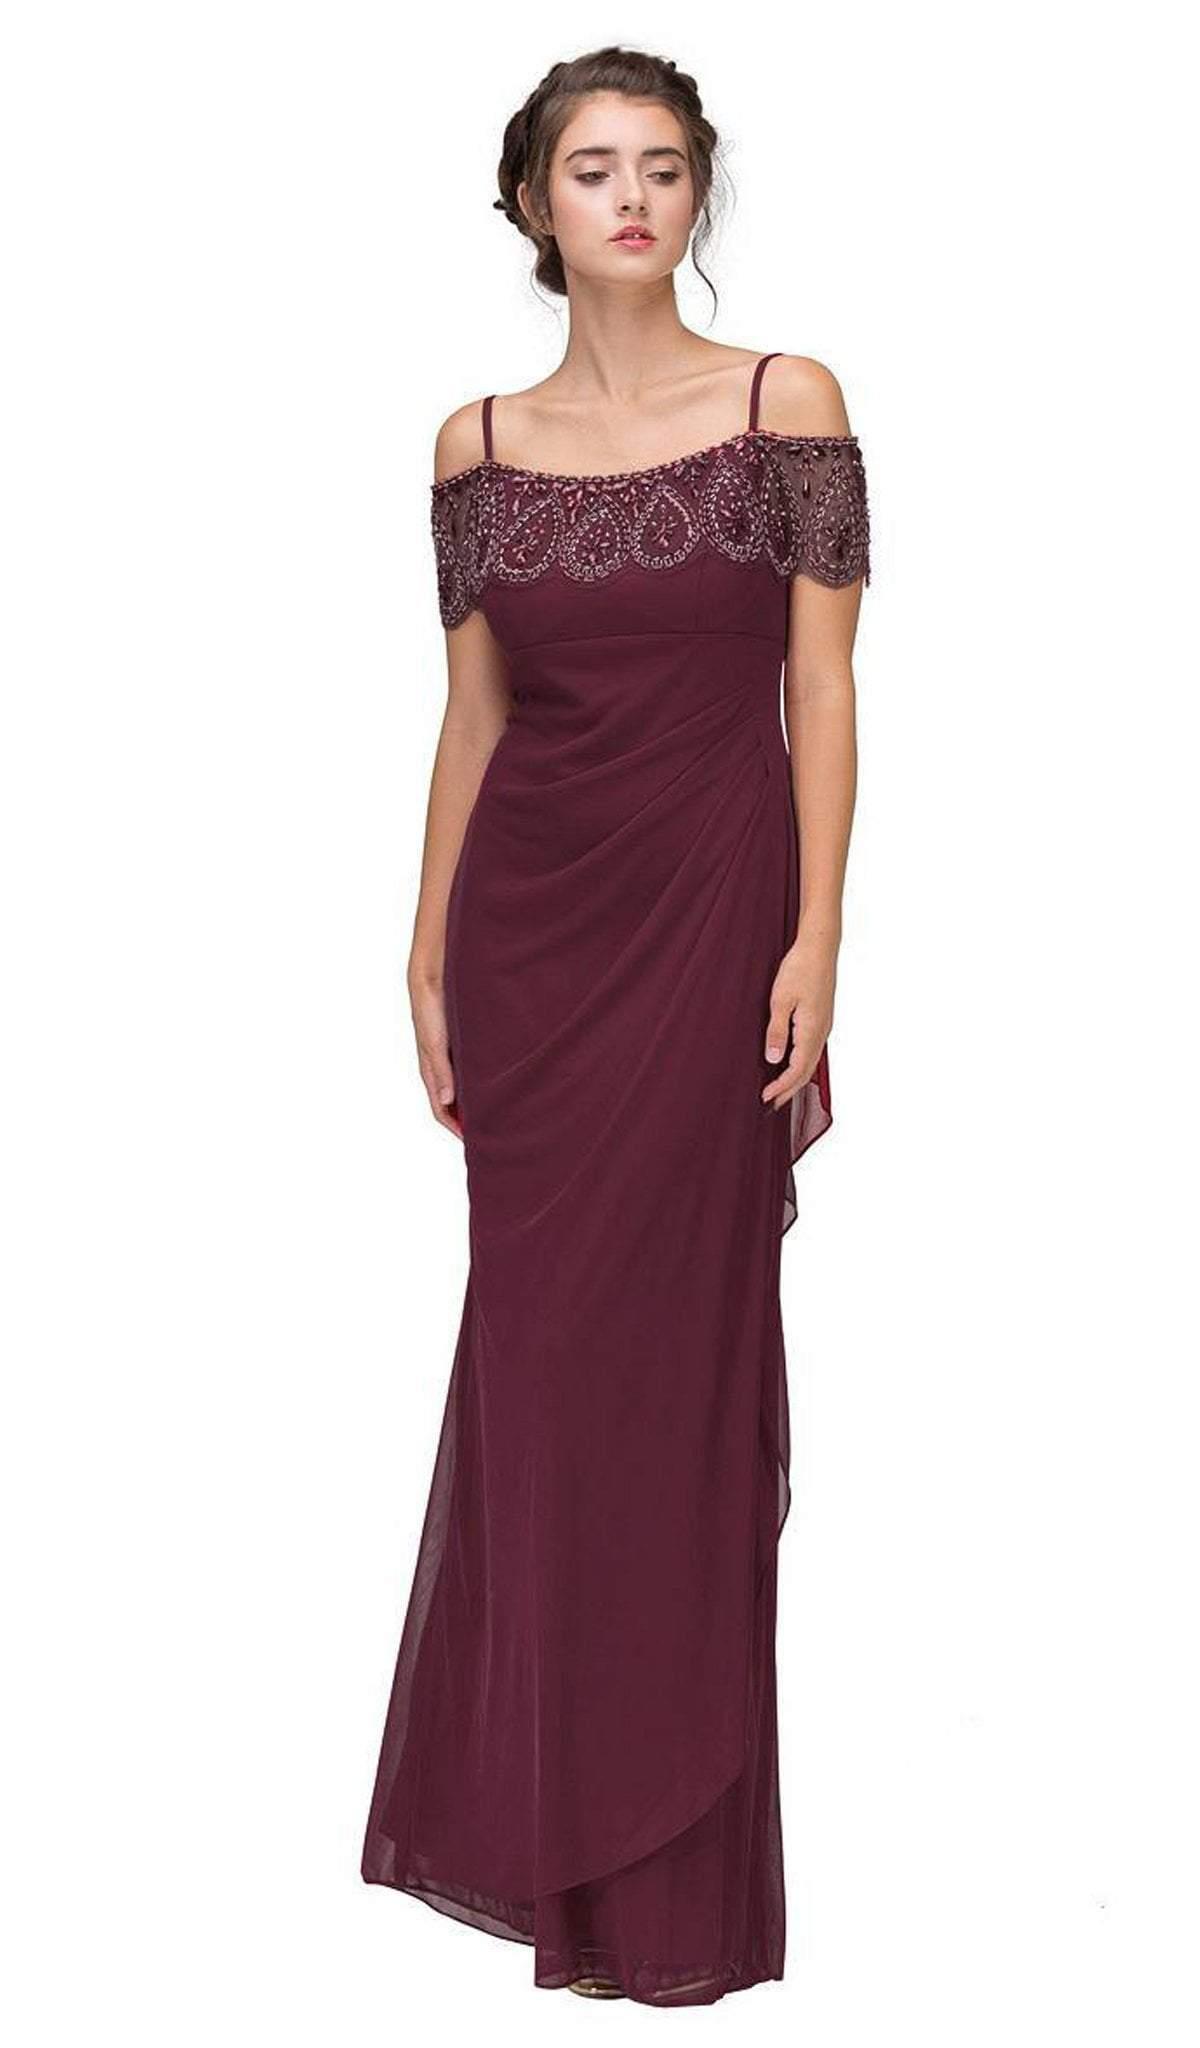 Eureka Fashion - 3937 Beaded Off-Shoulder Chiffon Sheath Dress